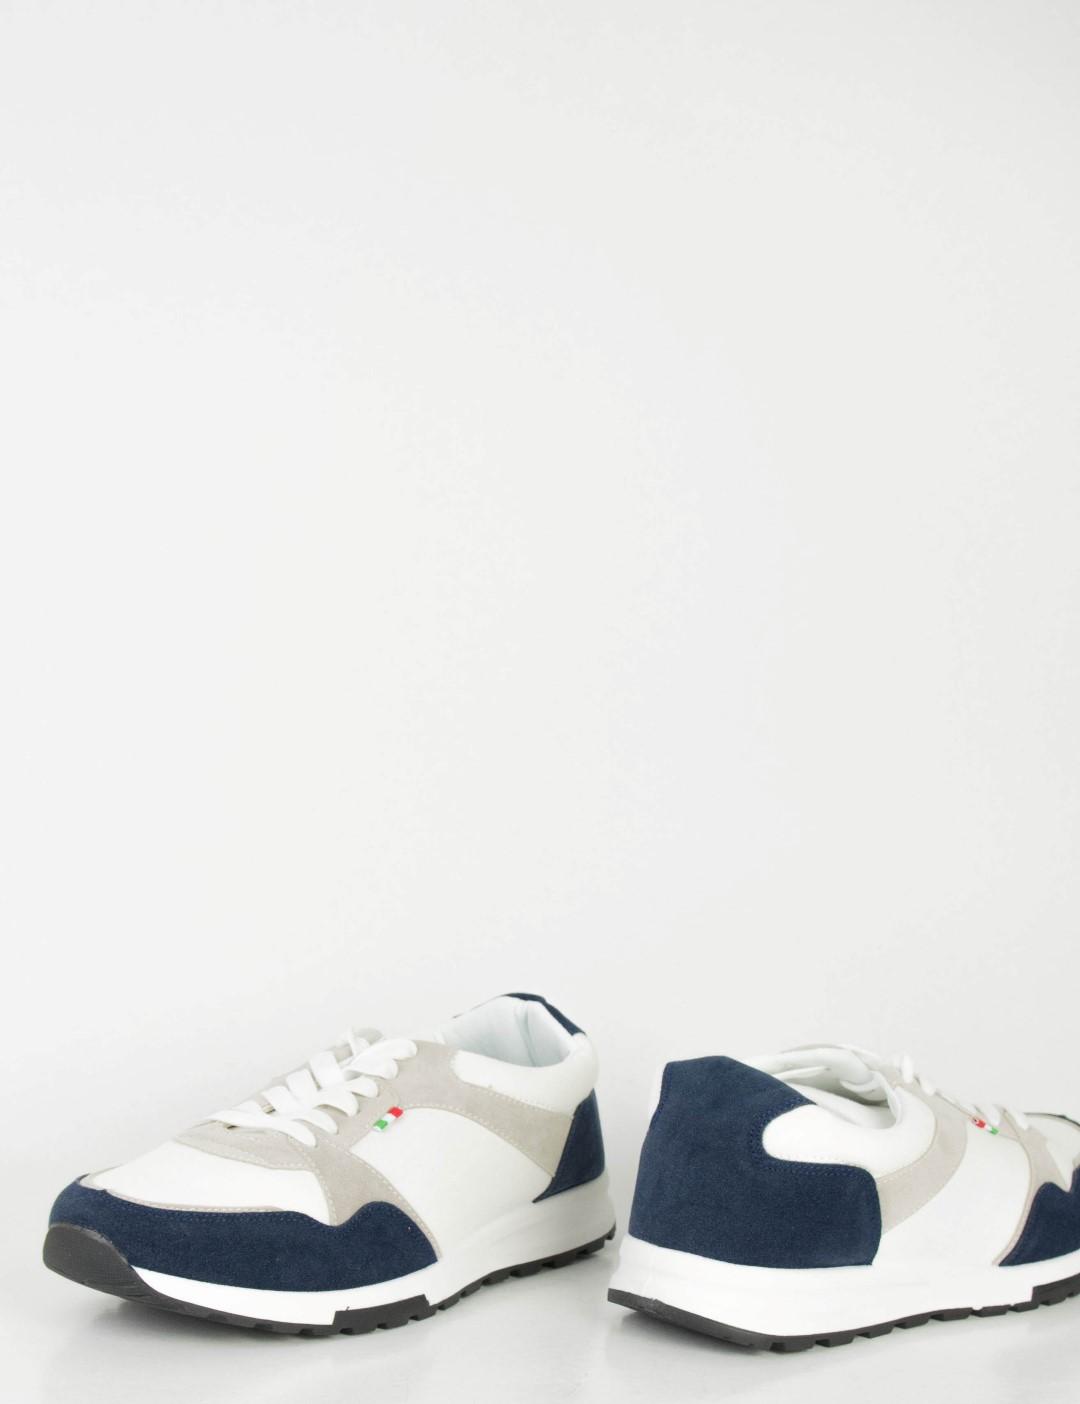 1b31c32bd5a Ανδρικά λευκά Sneakers με κορδόνια και διχρωμία B15353K